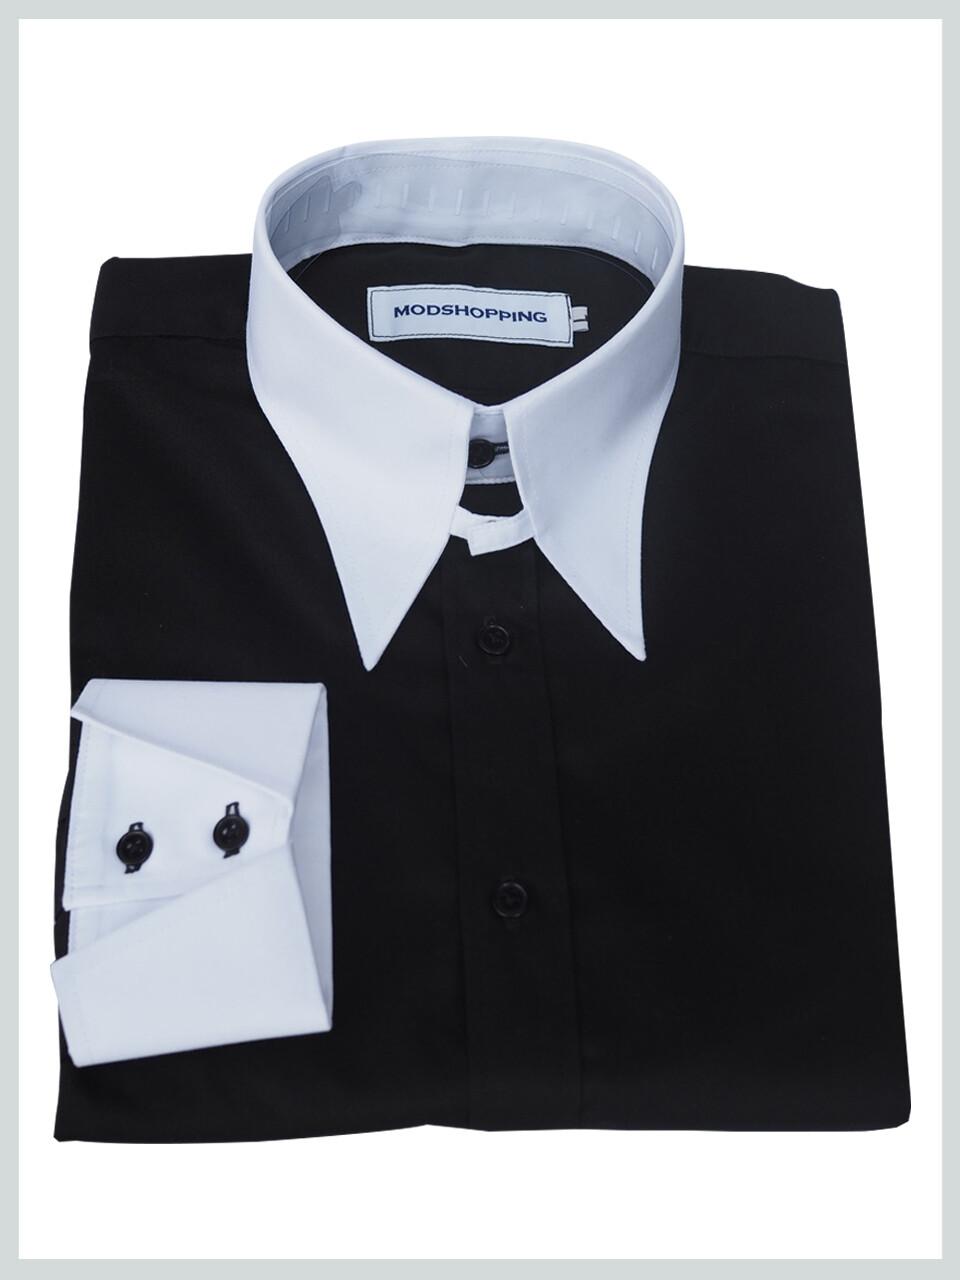 Black Tab Collar Long Sleeves 60s Design Shirt|Mod Clothing